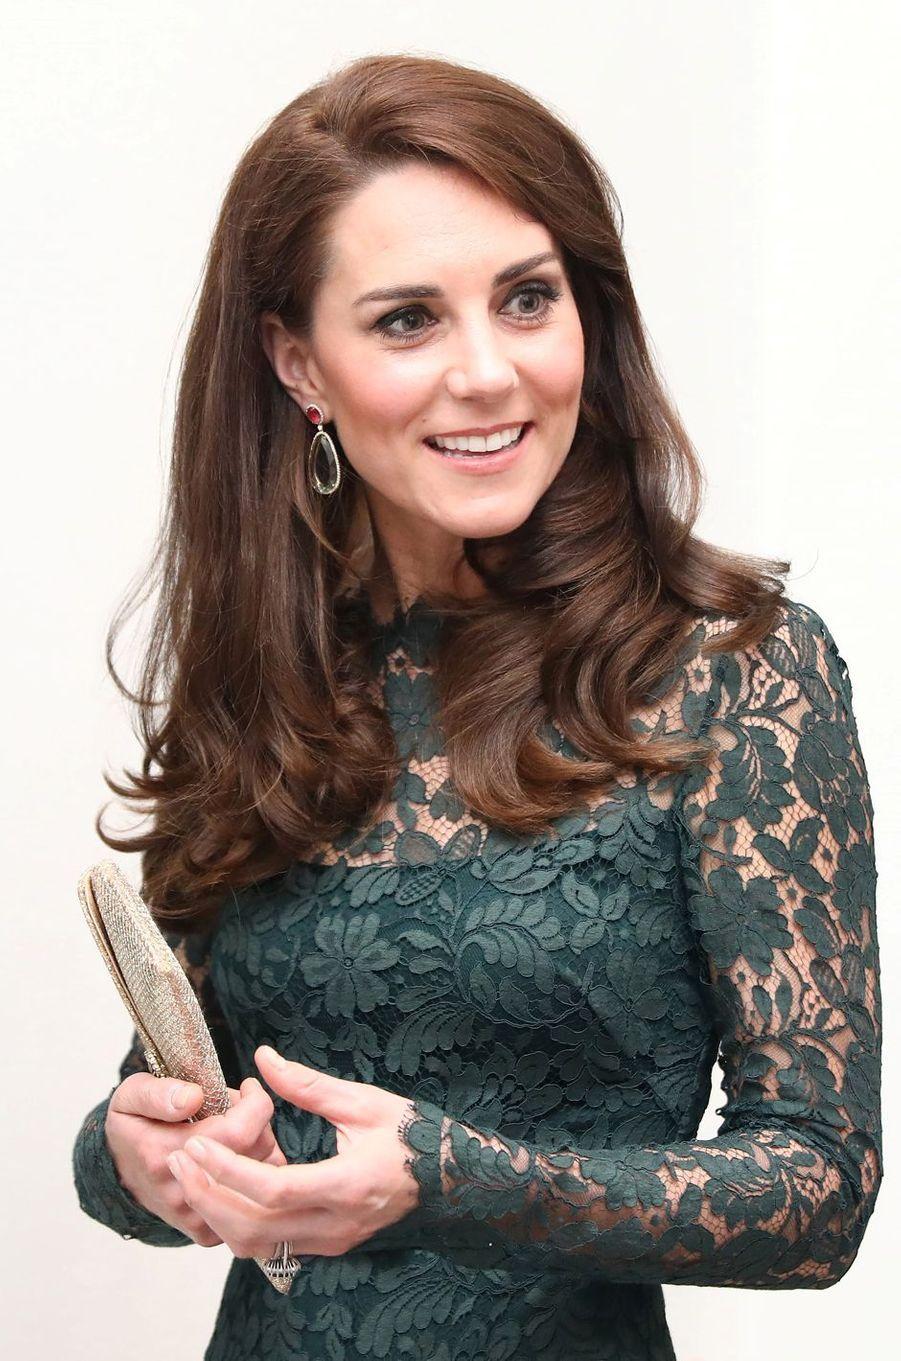 La duchesse Catherine de Cambridge, le 28 mars 2017